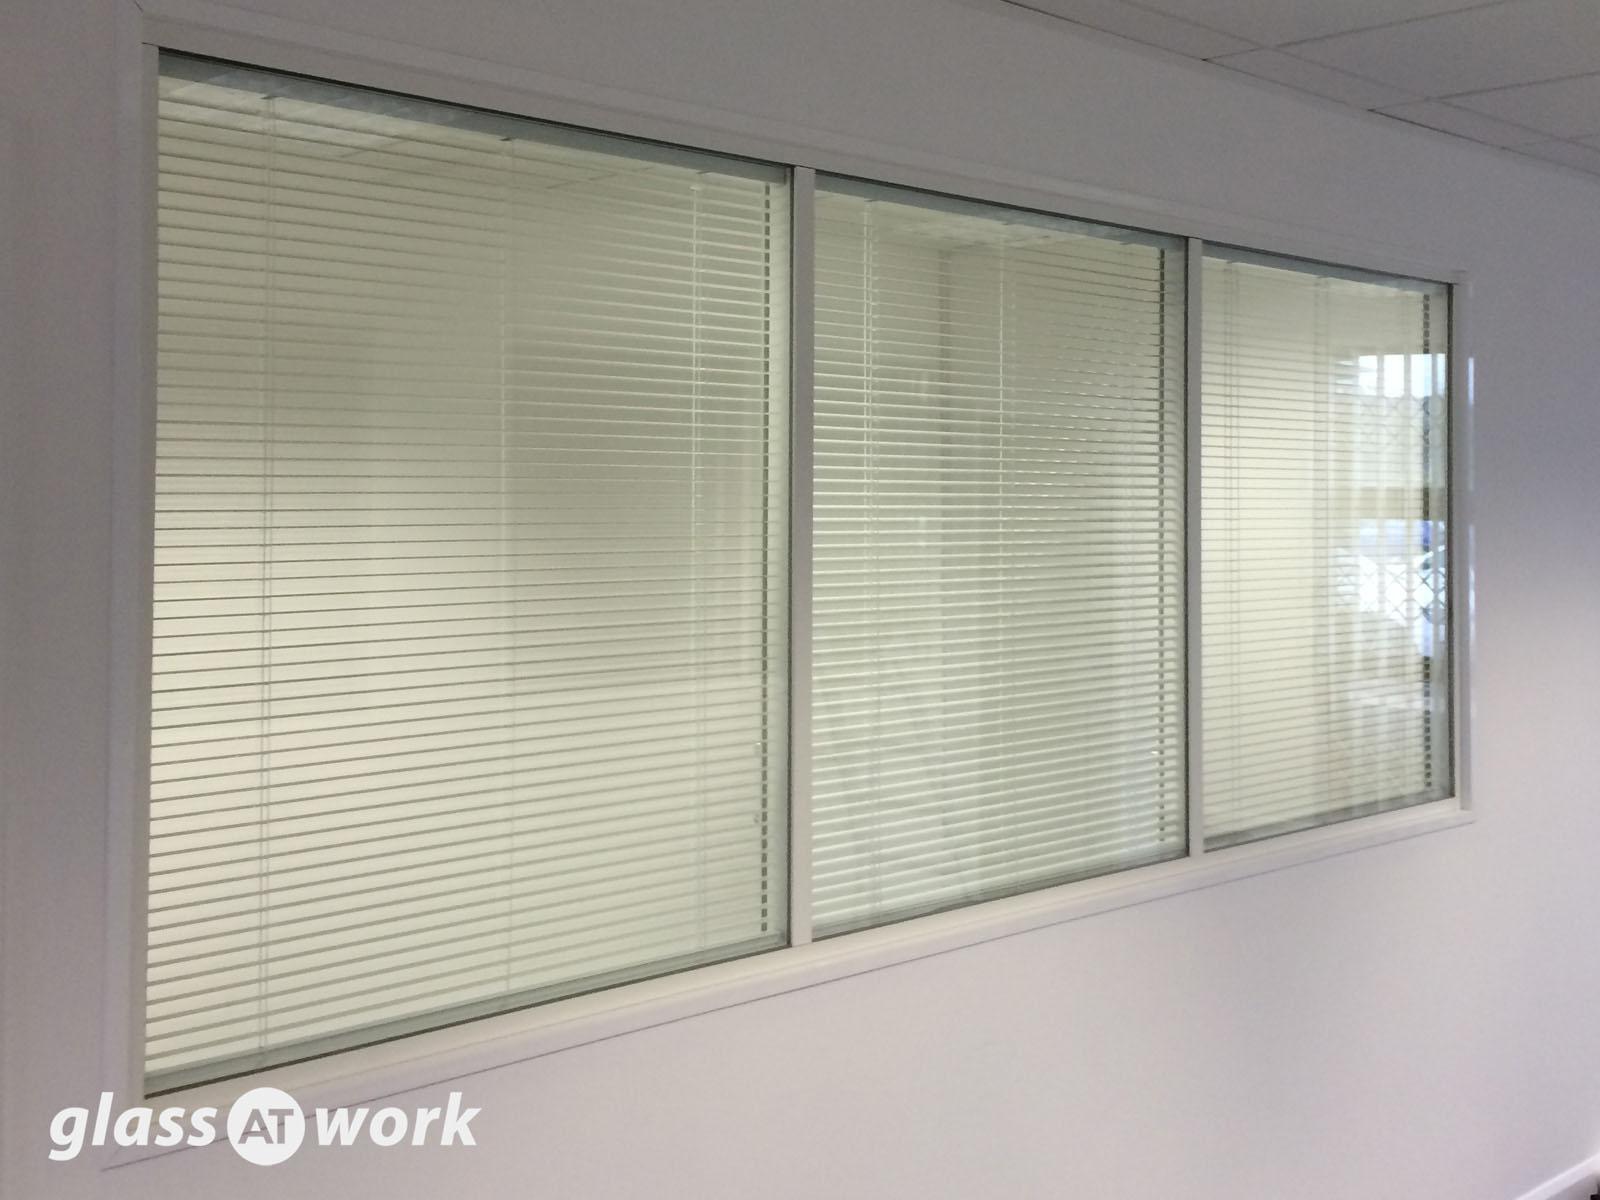 office glass windows. Double Glazed Frameless Glass Office Partitioning Windows